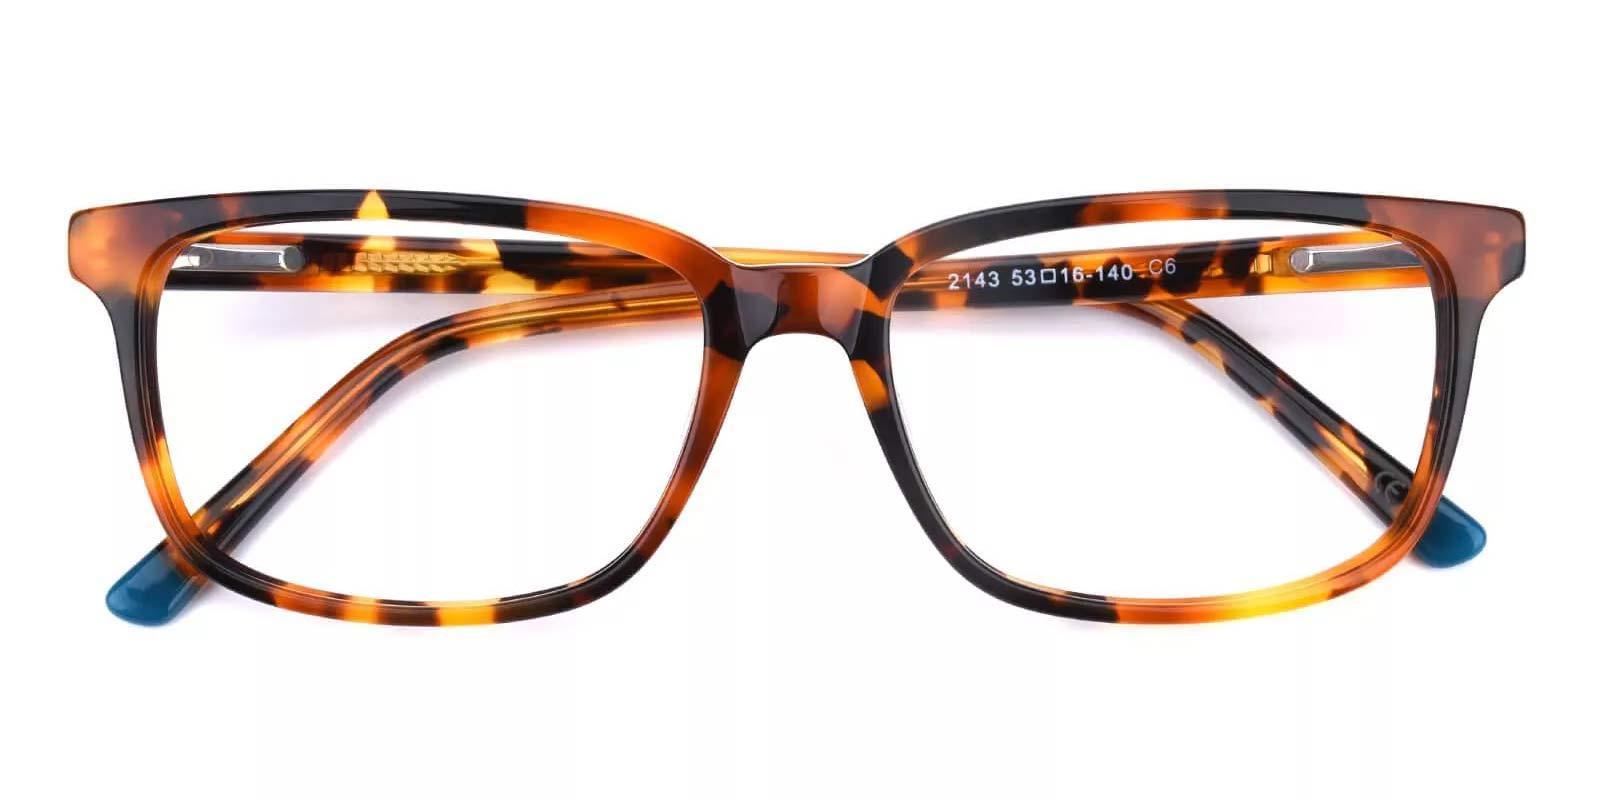 Connotation-Tortoise-Rectangle-Acetate-Eyeglasses-detail